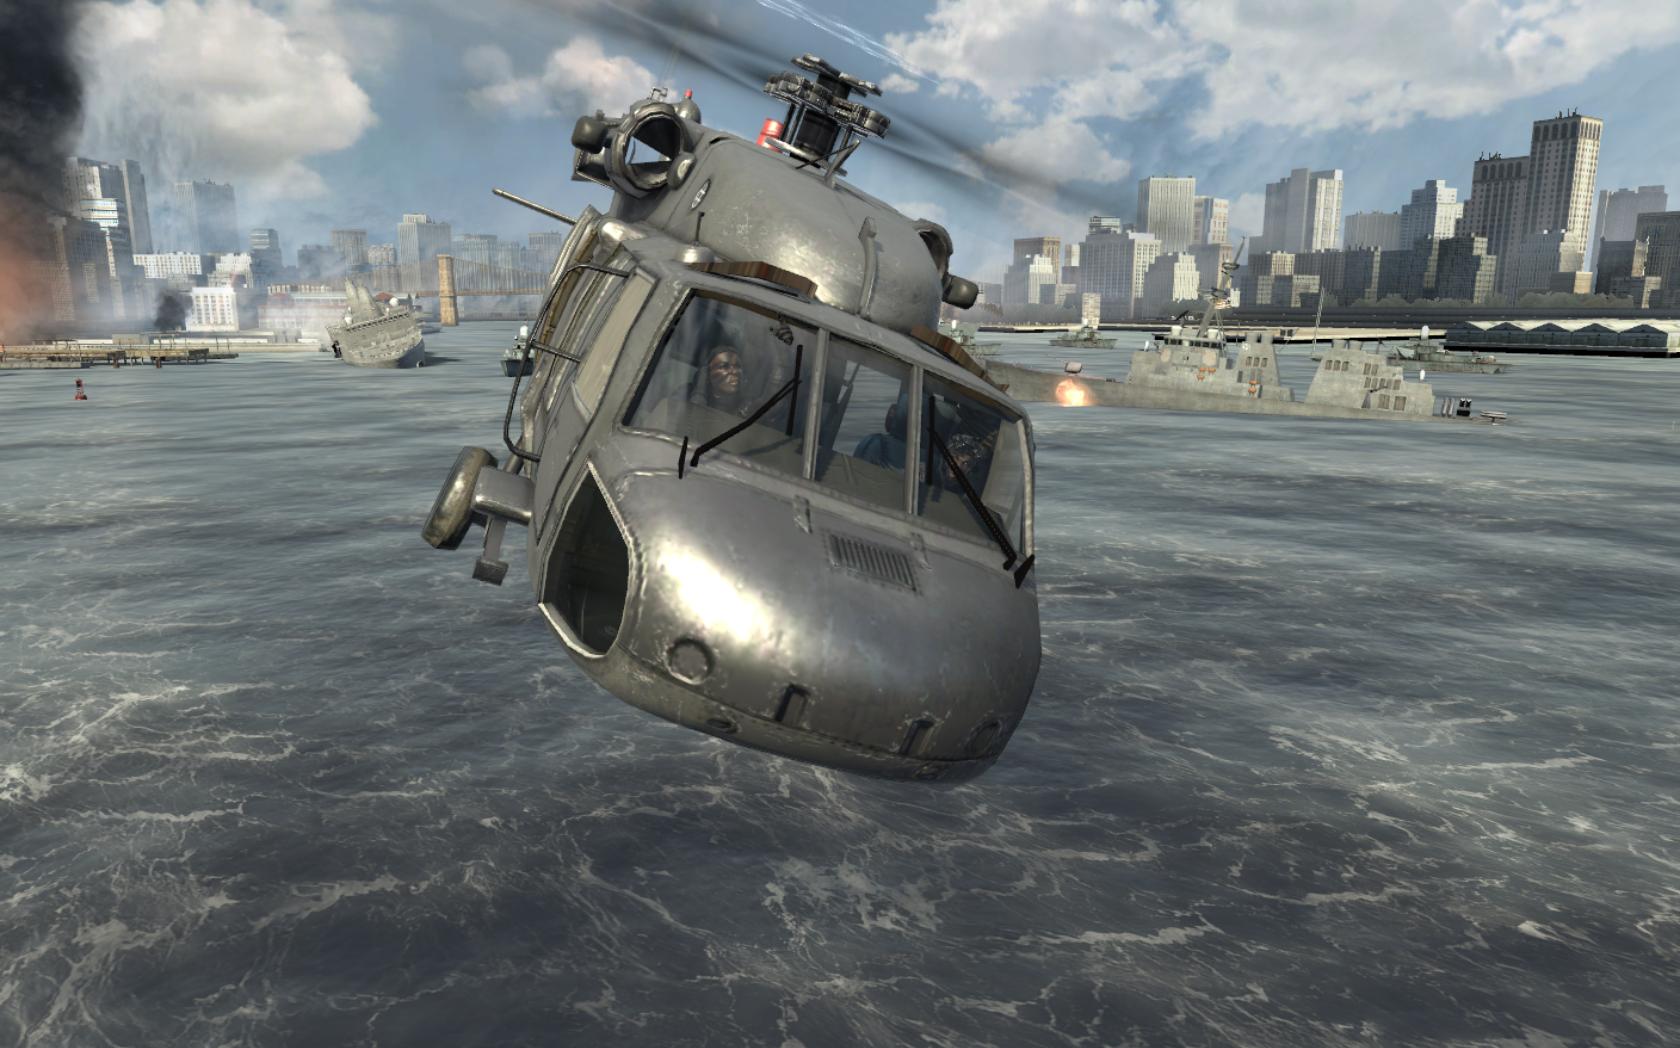 Image - U.S. Navy SEALs piloting the UH-60 Over Reactor ...